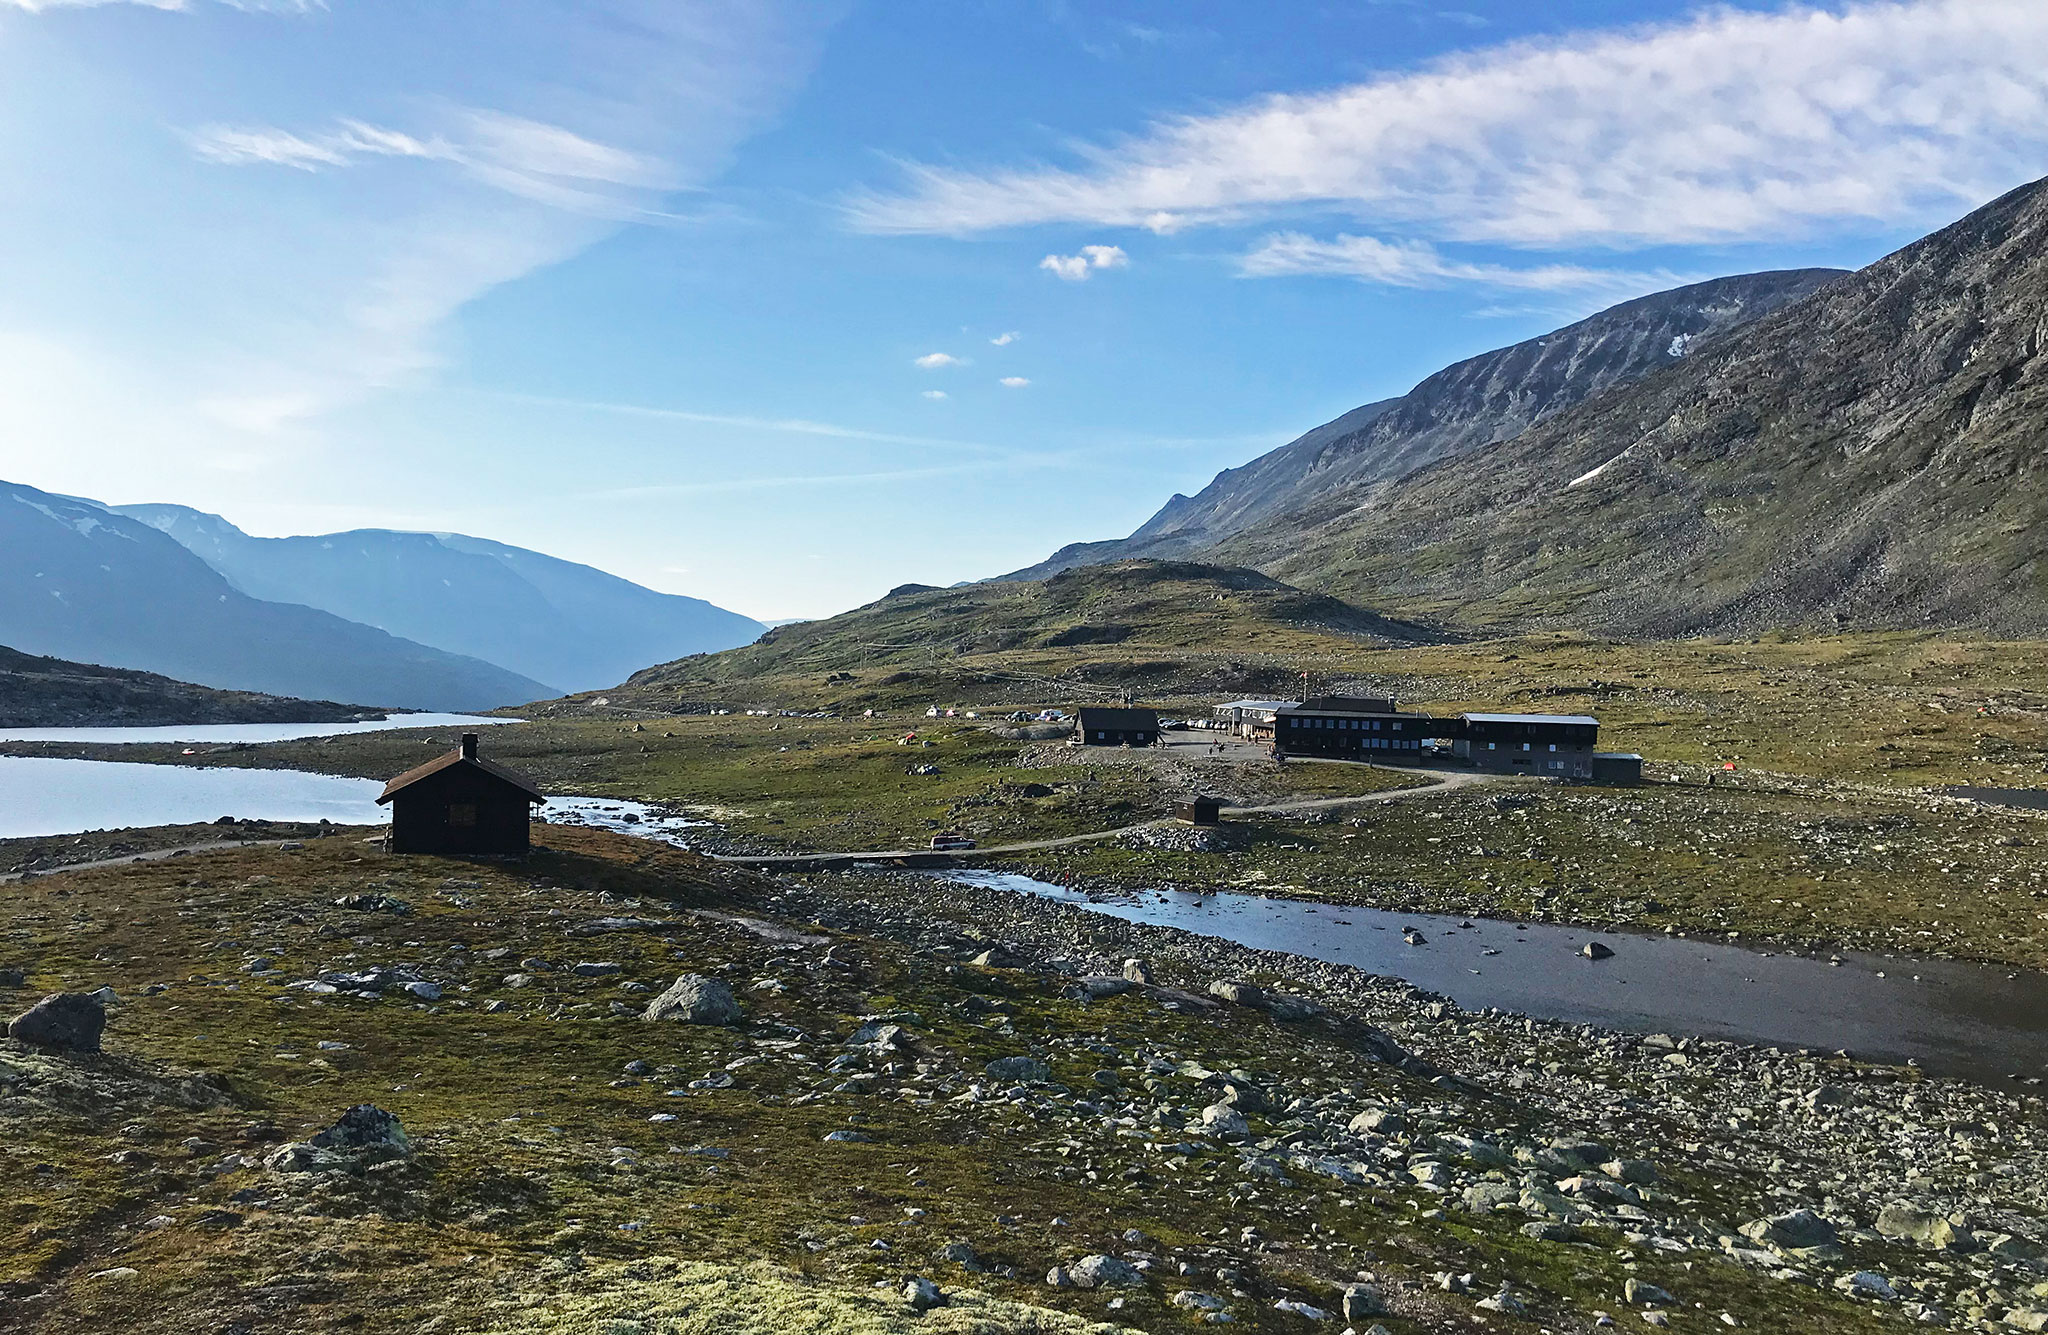 Leirvassbu in Jotunheimen, by the very border of the national reserve/park